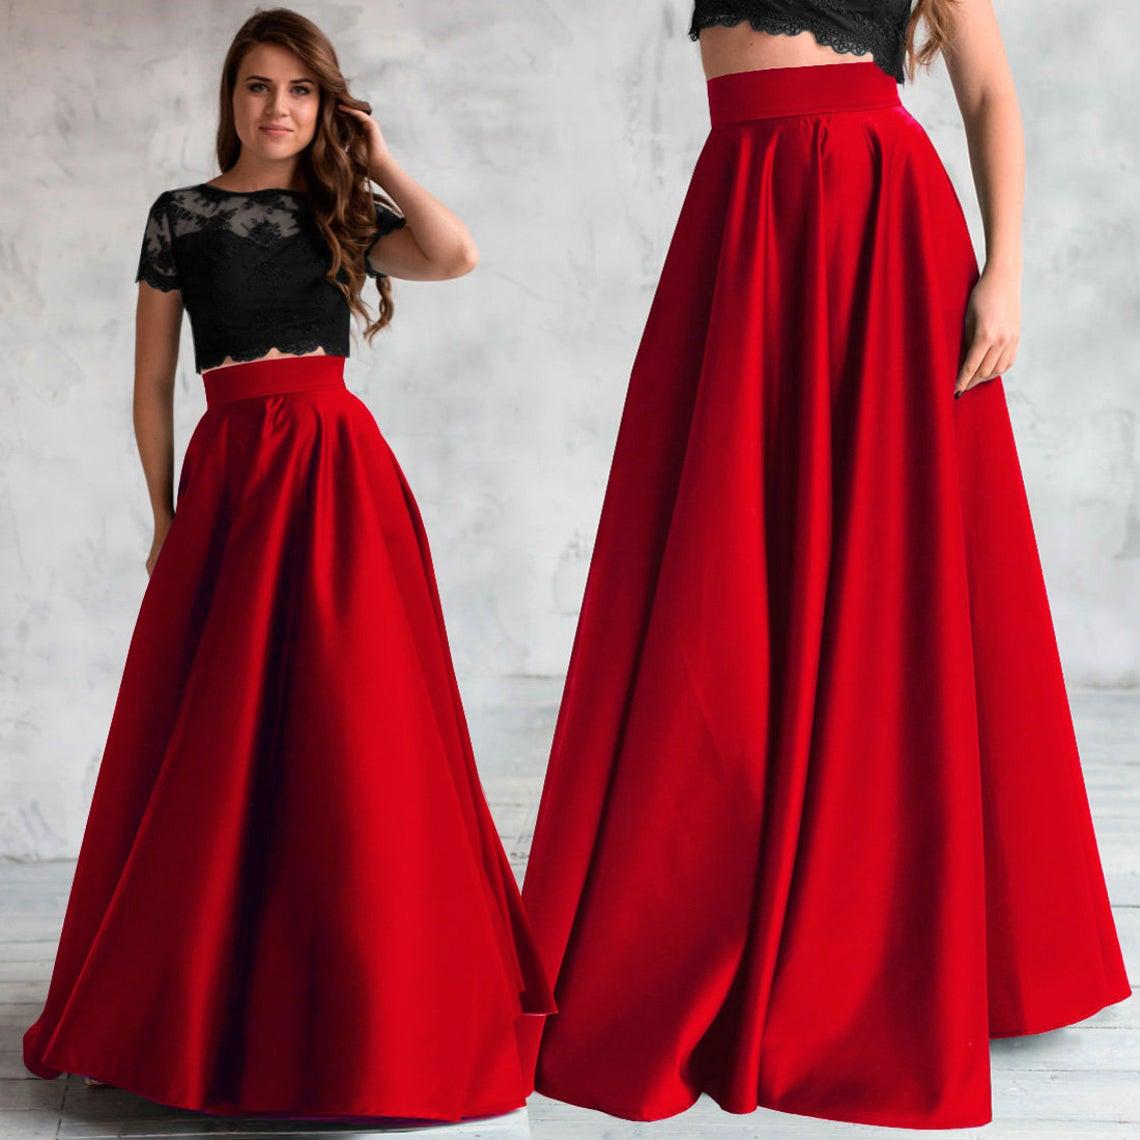 Elegant red satin skirt, maxi high waist satin skirt, red skirt with pockets, long satin skirt